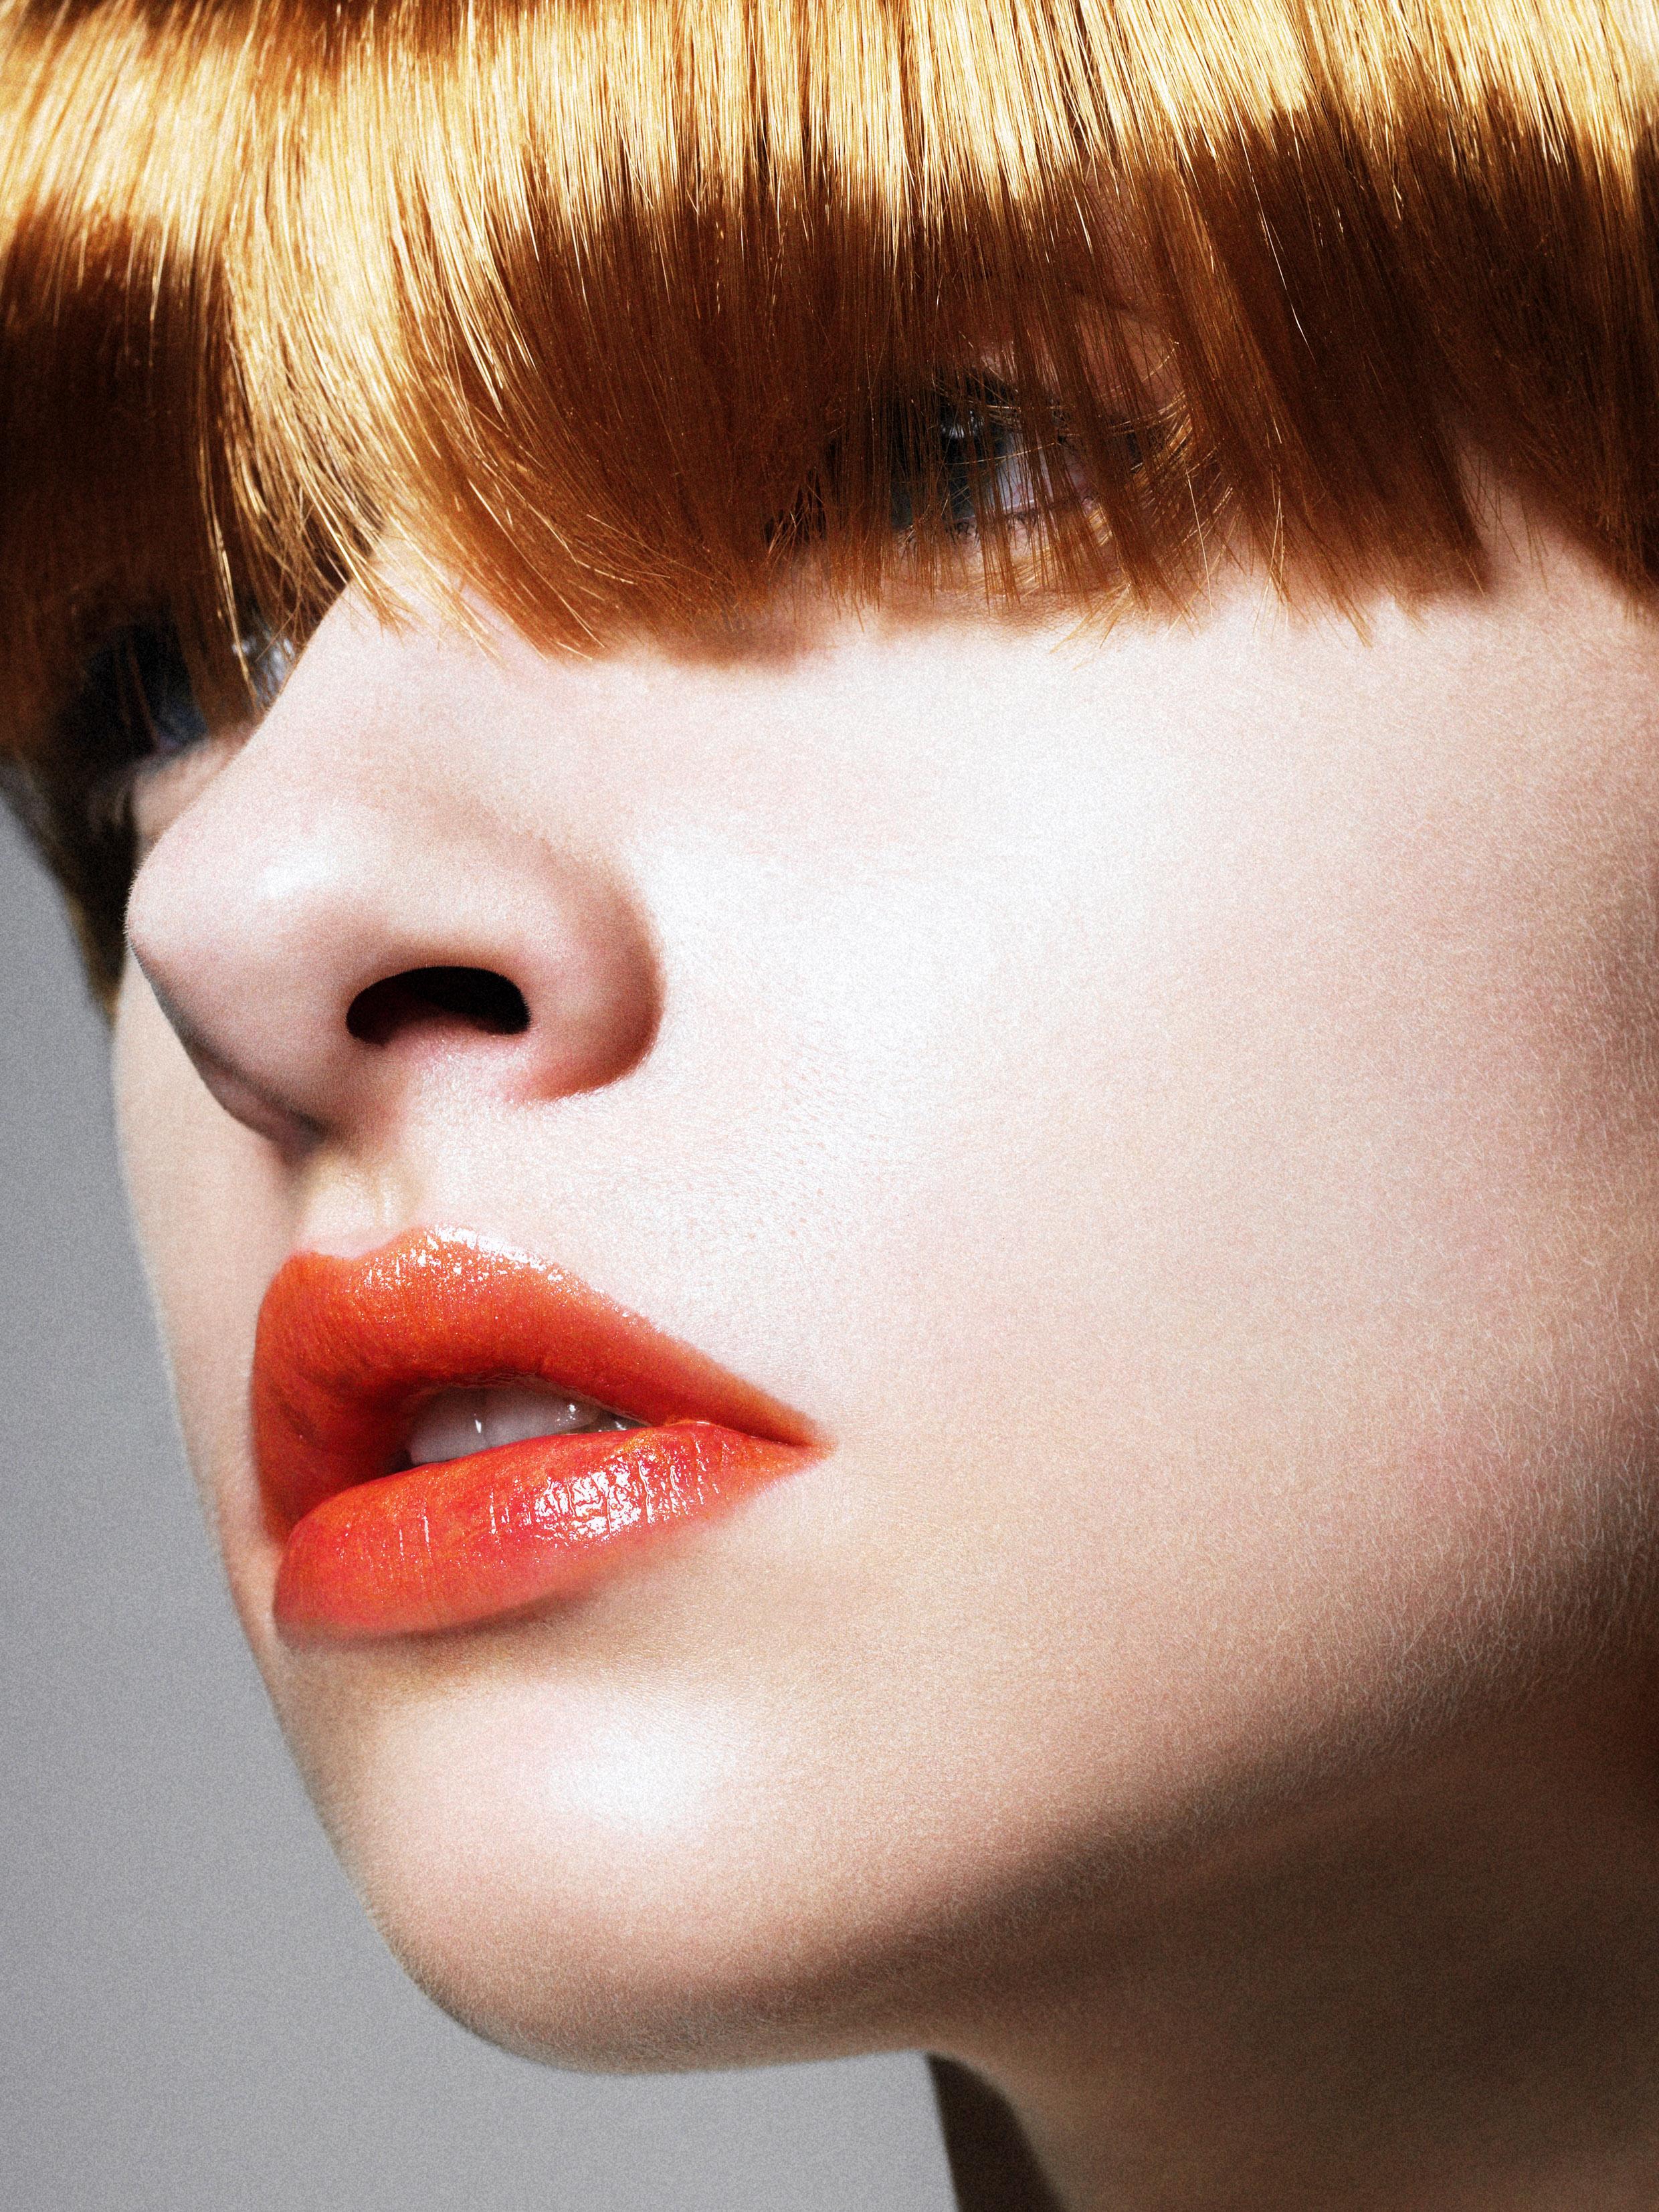 kwp-style-lip-3.jpg